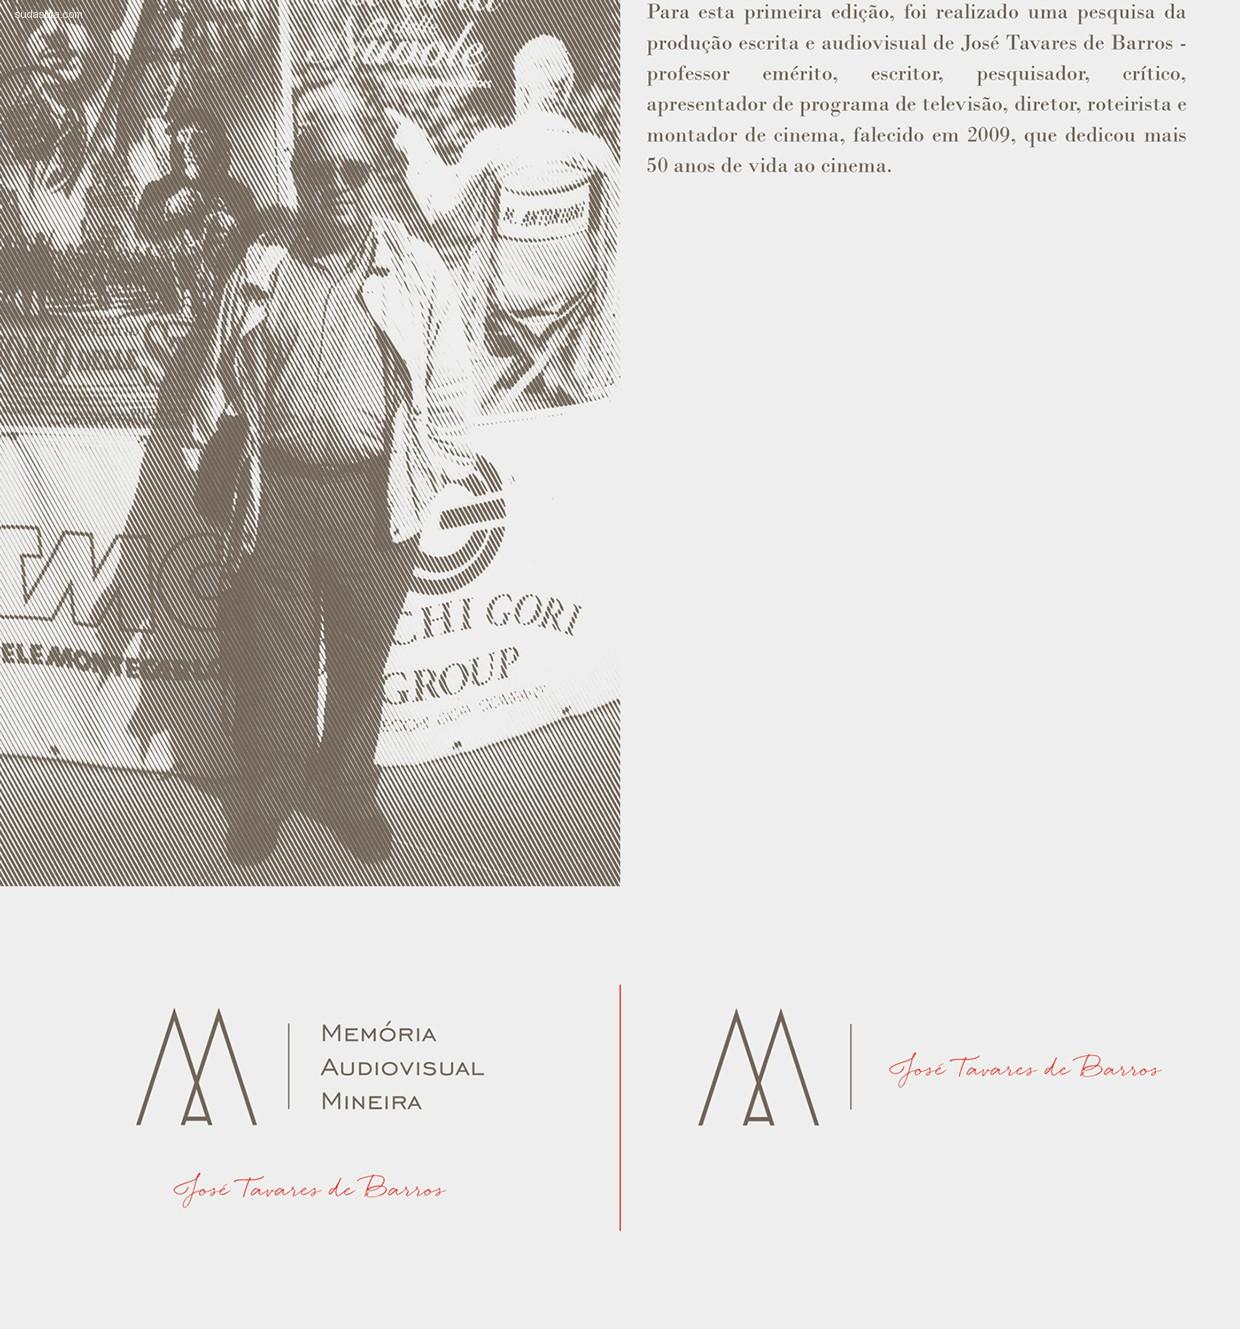 Memória Audiovisual Mineira 品牌设计欣赏